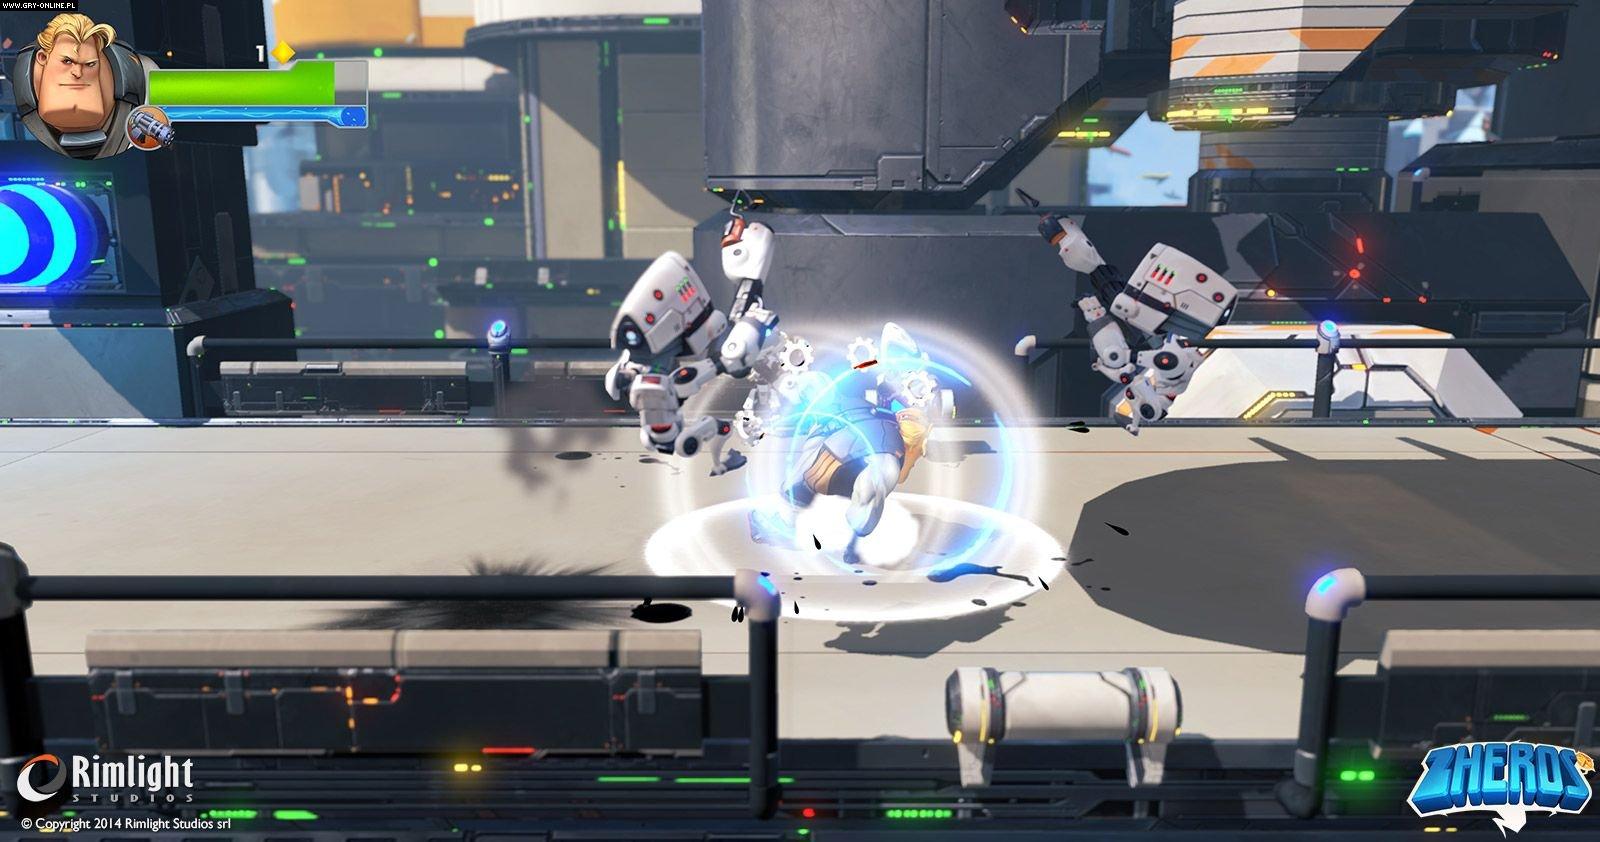 Ps4 Games Science Fiction : Zheros screenshots gallery screenshot